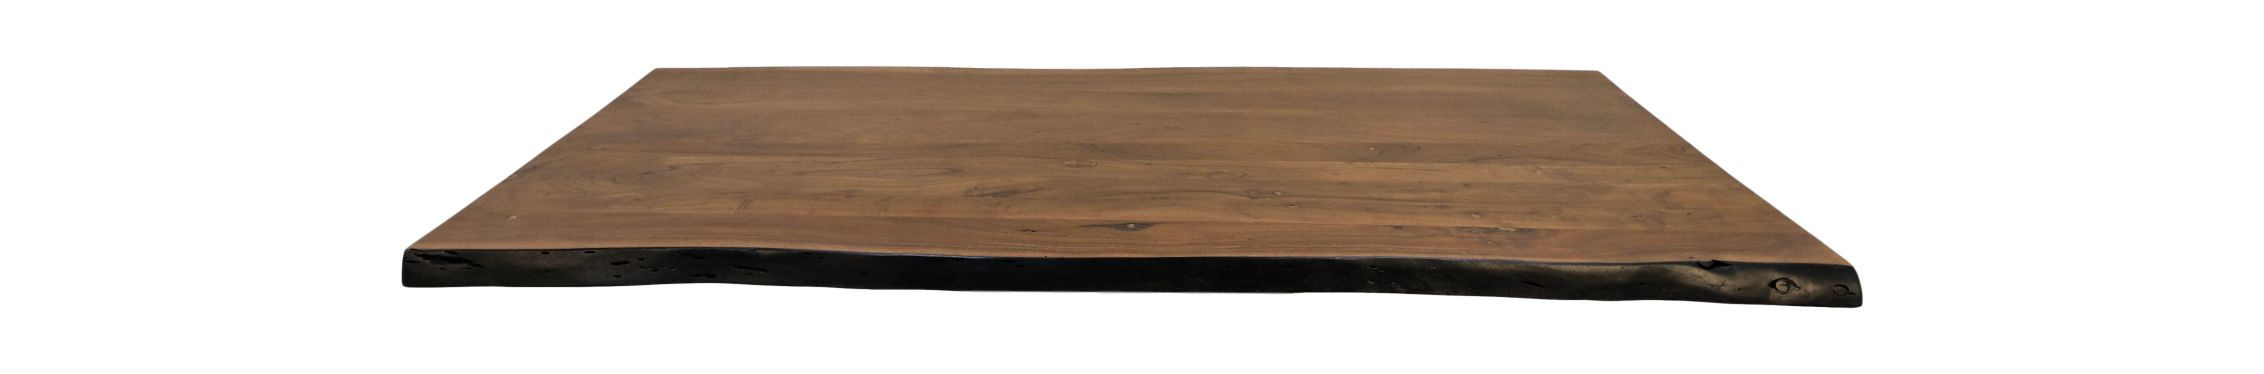 Tafelblad live edge - 200x100x5 - Walnoot bruin - Acaciahout